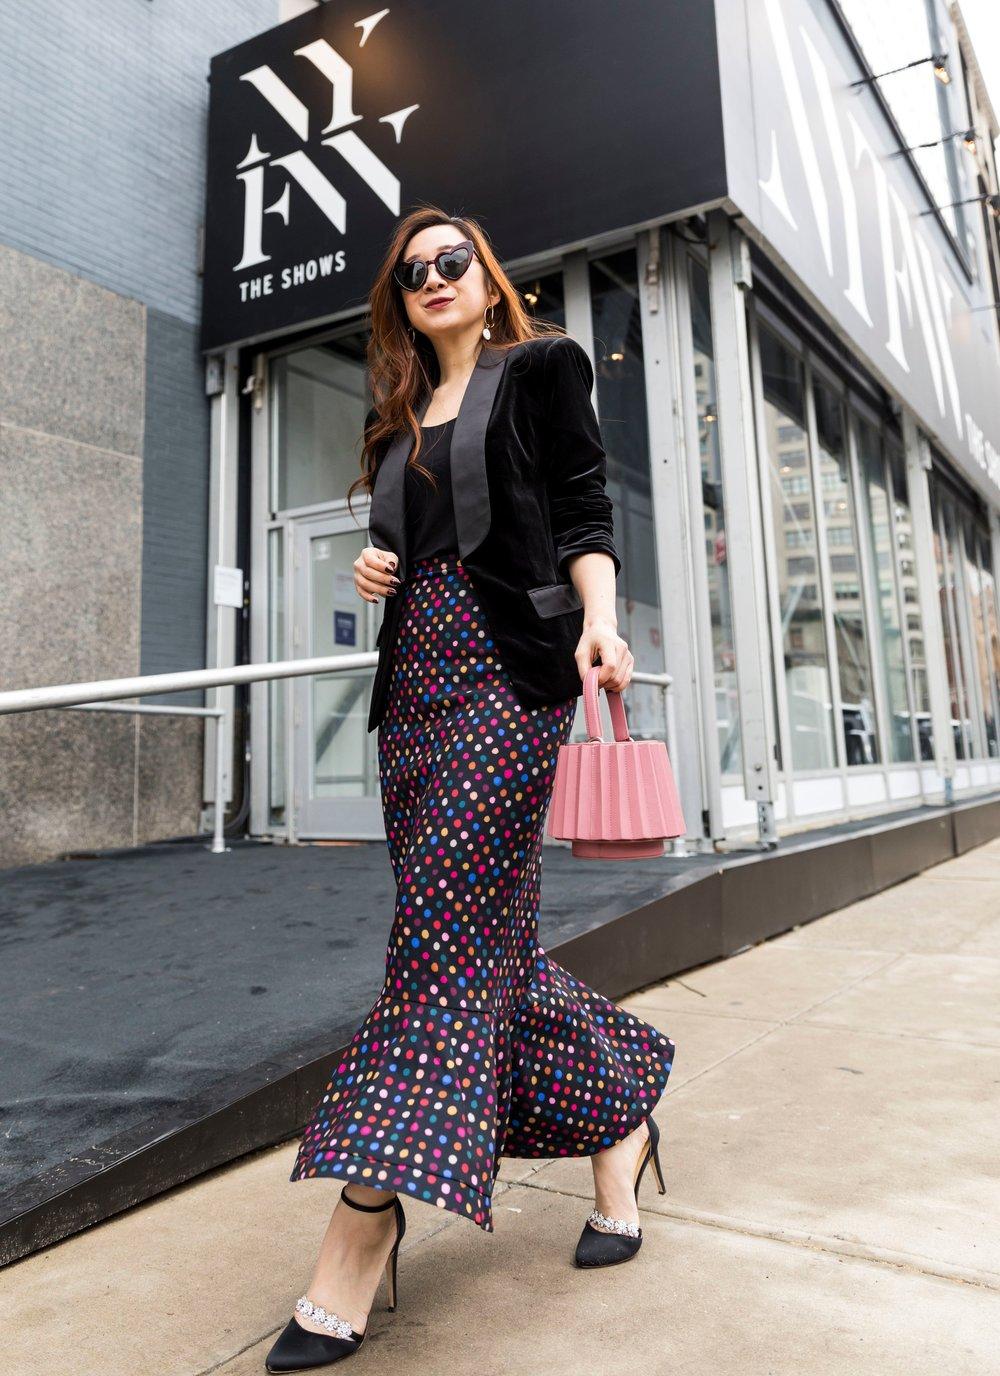 It was so much fun styling my Saloni polka dot skirt. Photo by Ashley Gallerani.